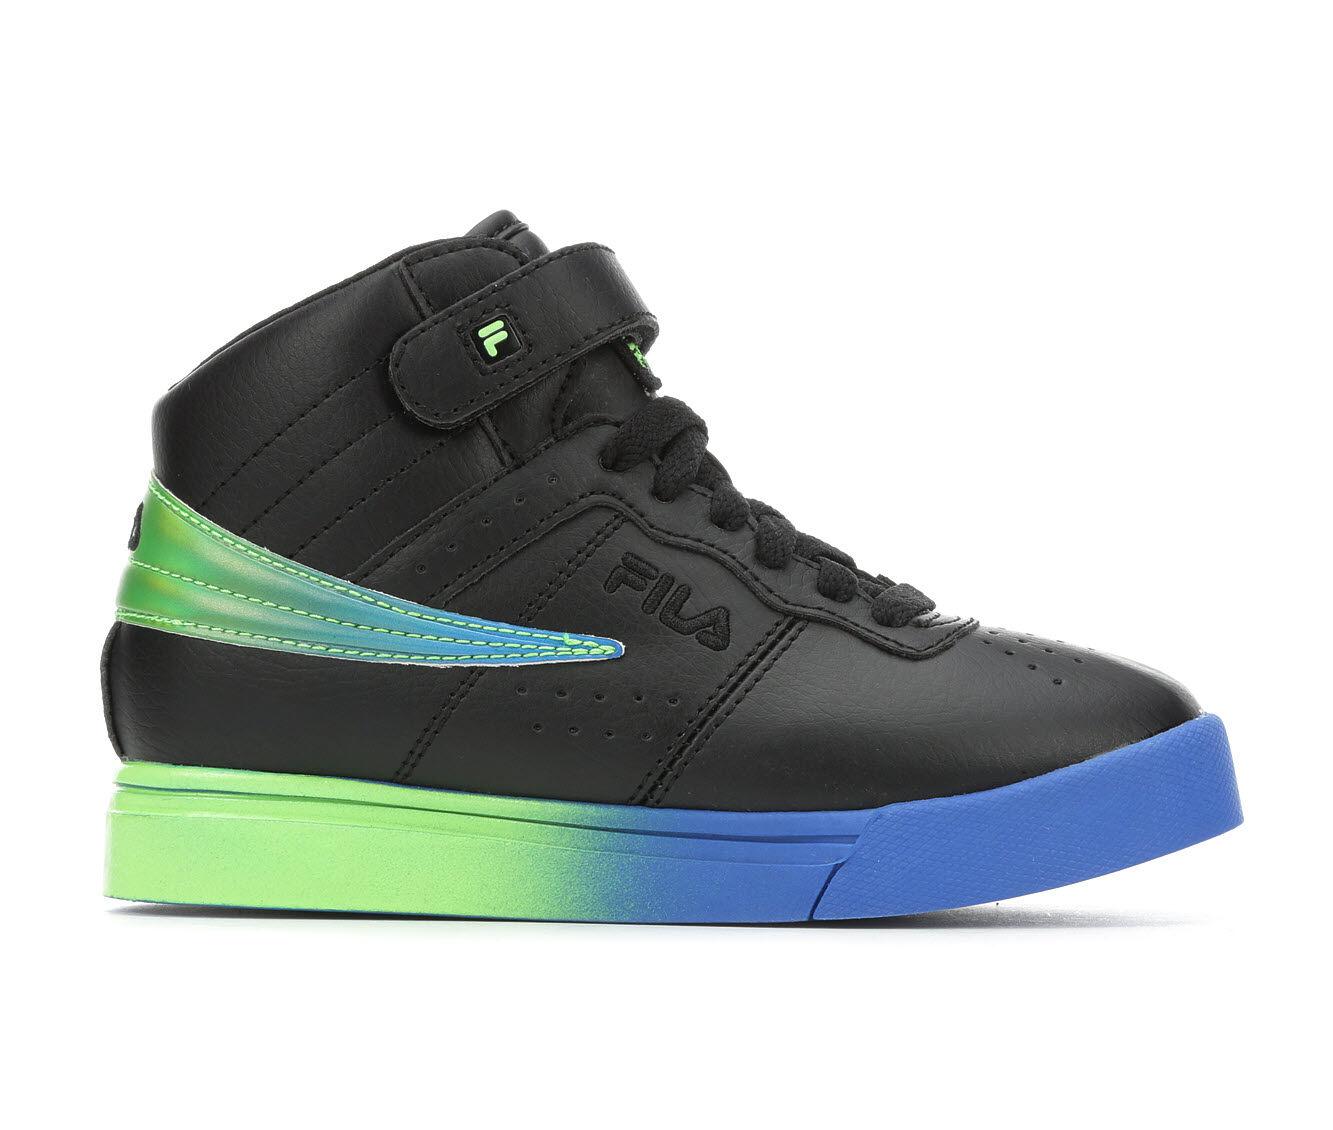 Kid Vulc 13 GF Sneakers | Shoe Carnival